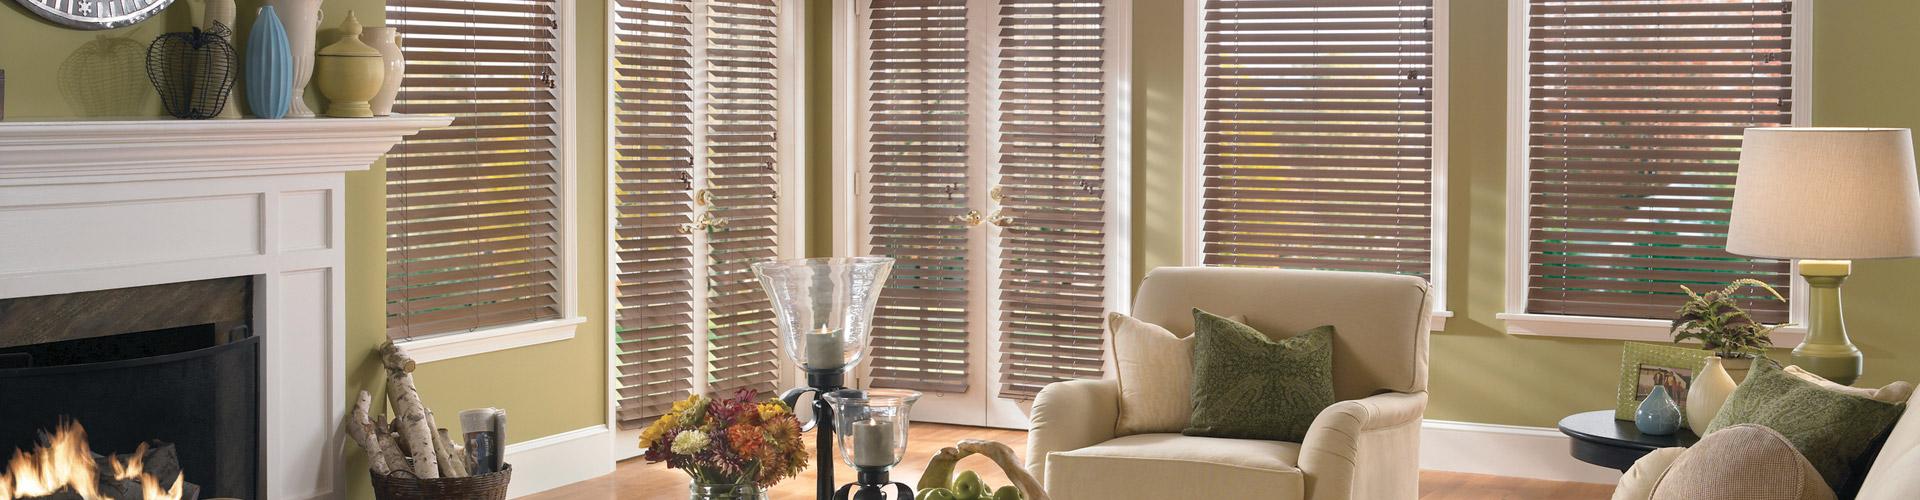 blindconcepts-window-blinds2